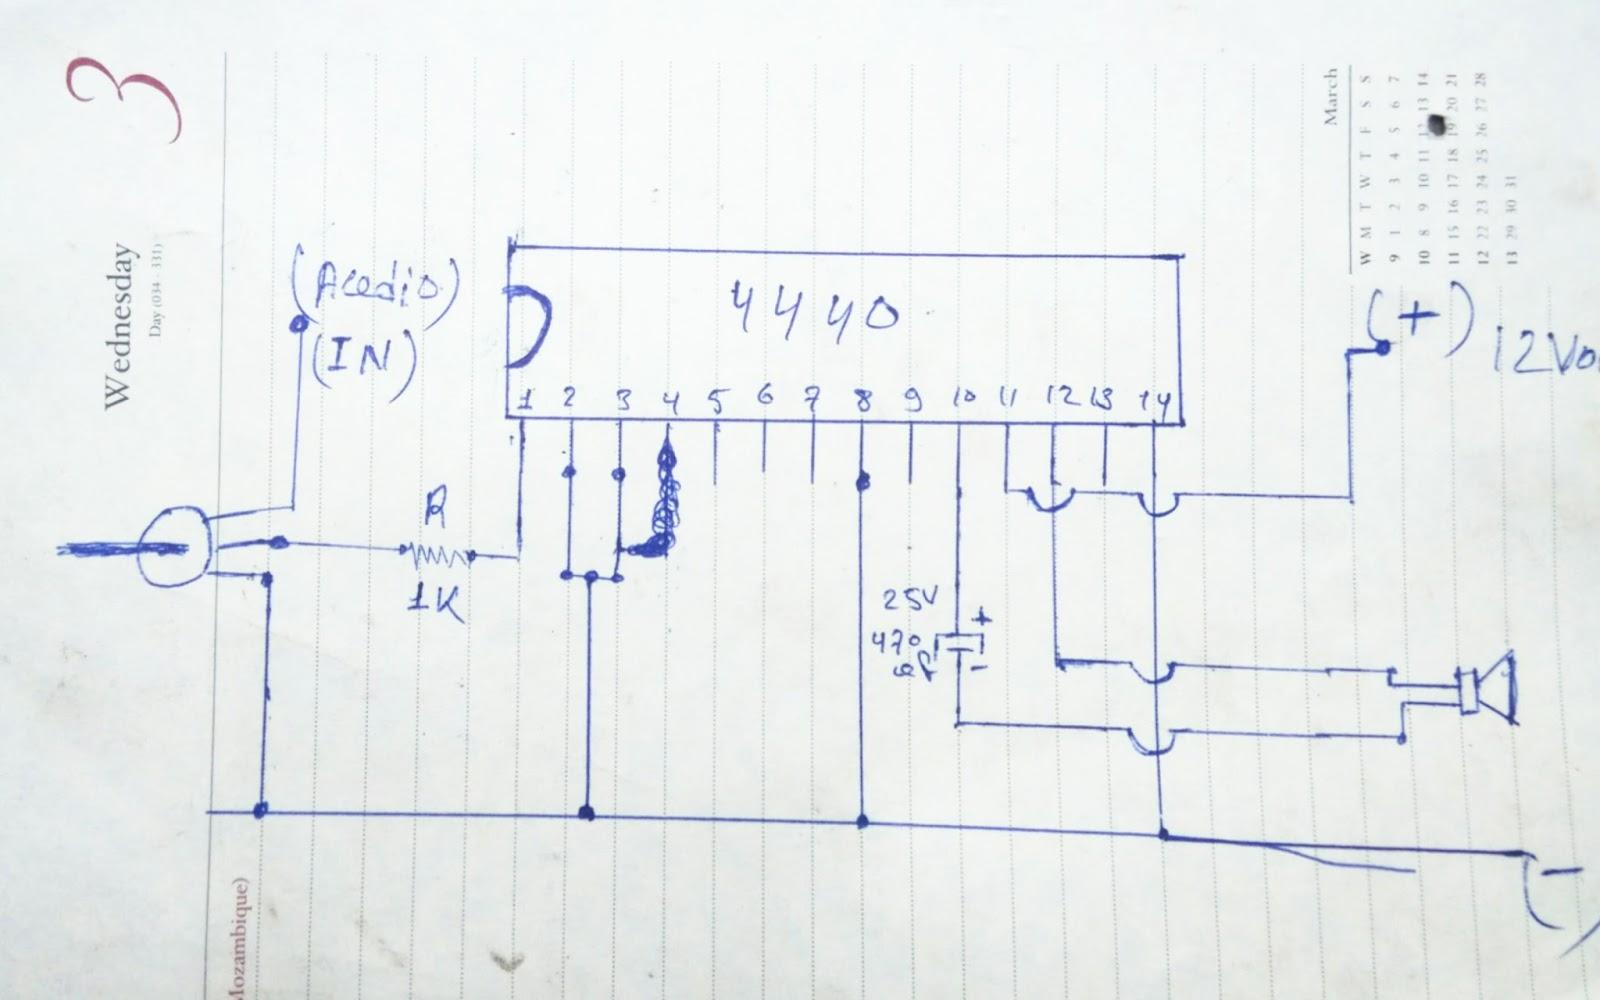 La4440 Audio Amplifier 40watt Without Pcb Rk Electronics Project And Video Diagram Electronic Design Ic Circuit Ku Kui Bhi Bana Shakta Hai Neeche